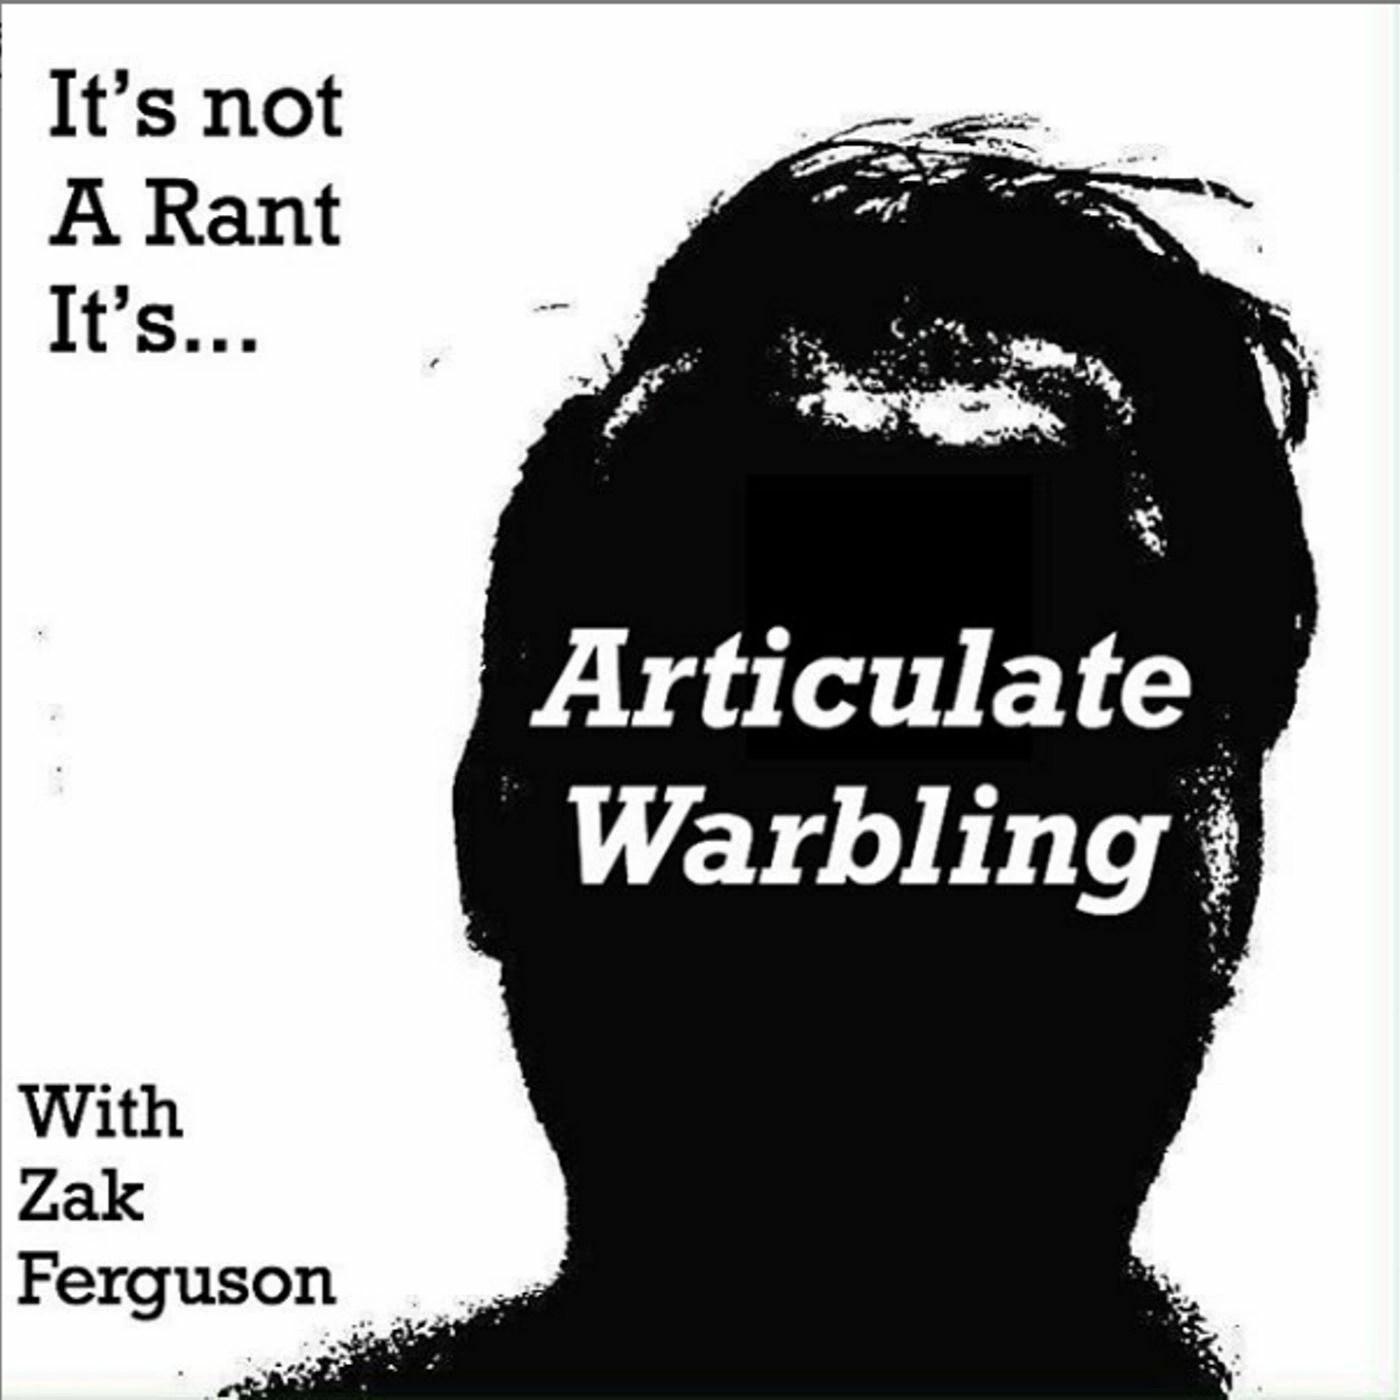 ArticulateWarbling.jpg